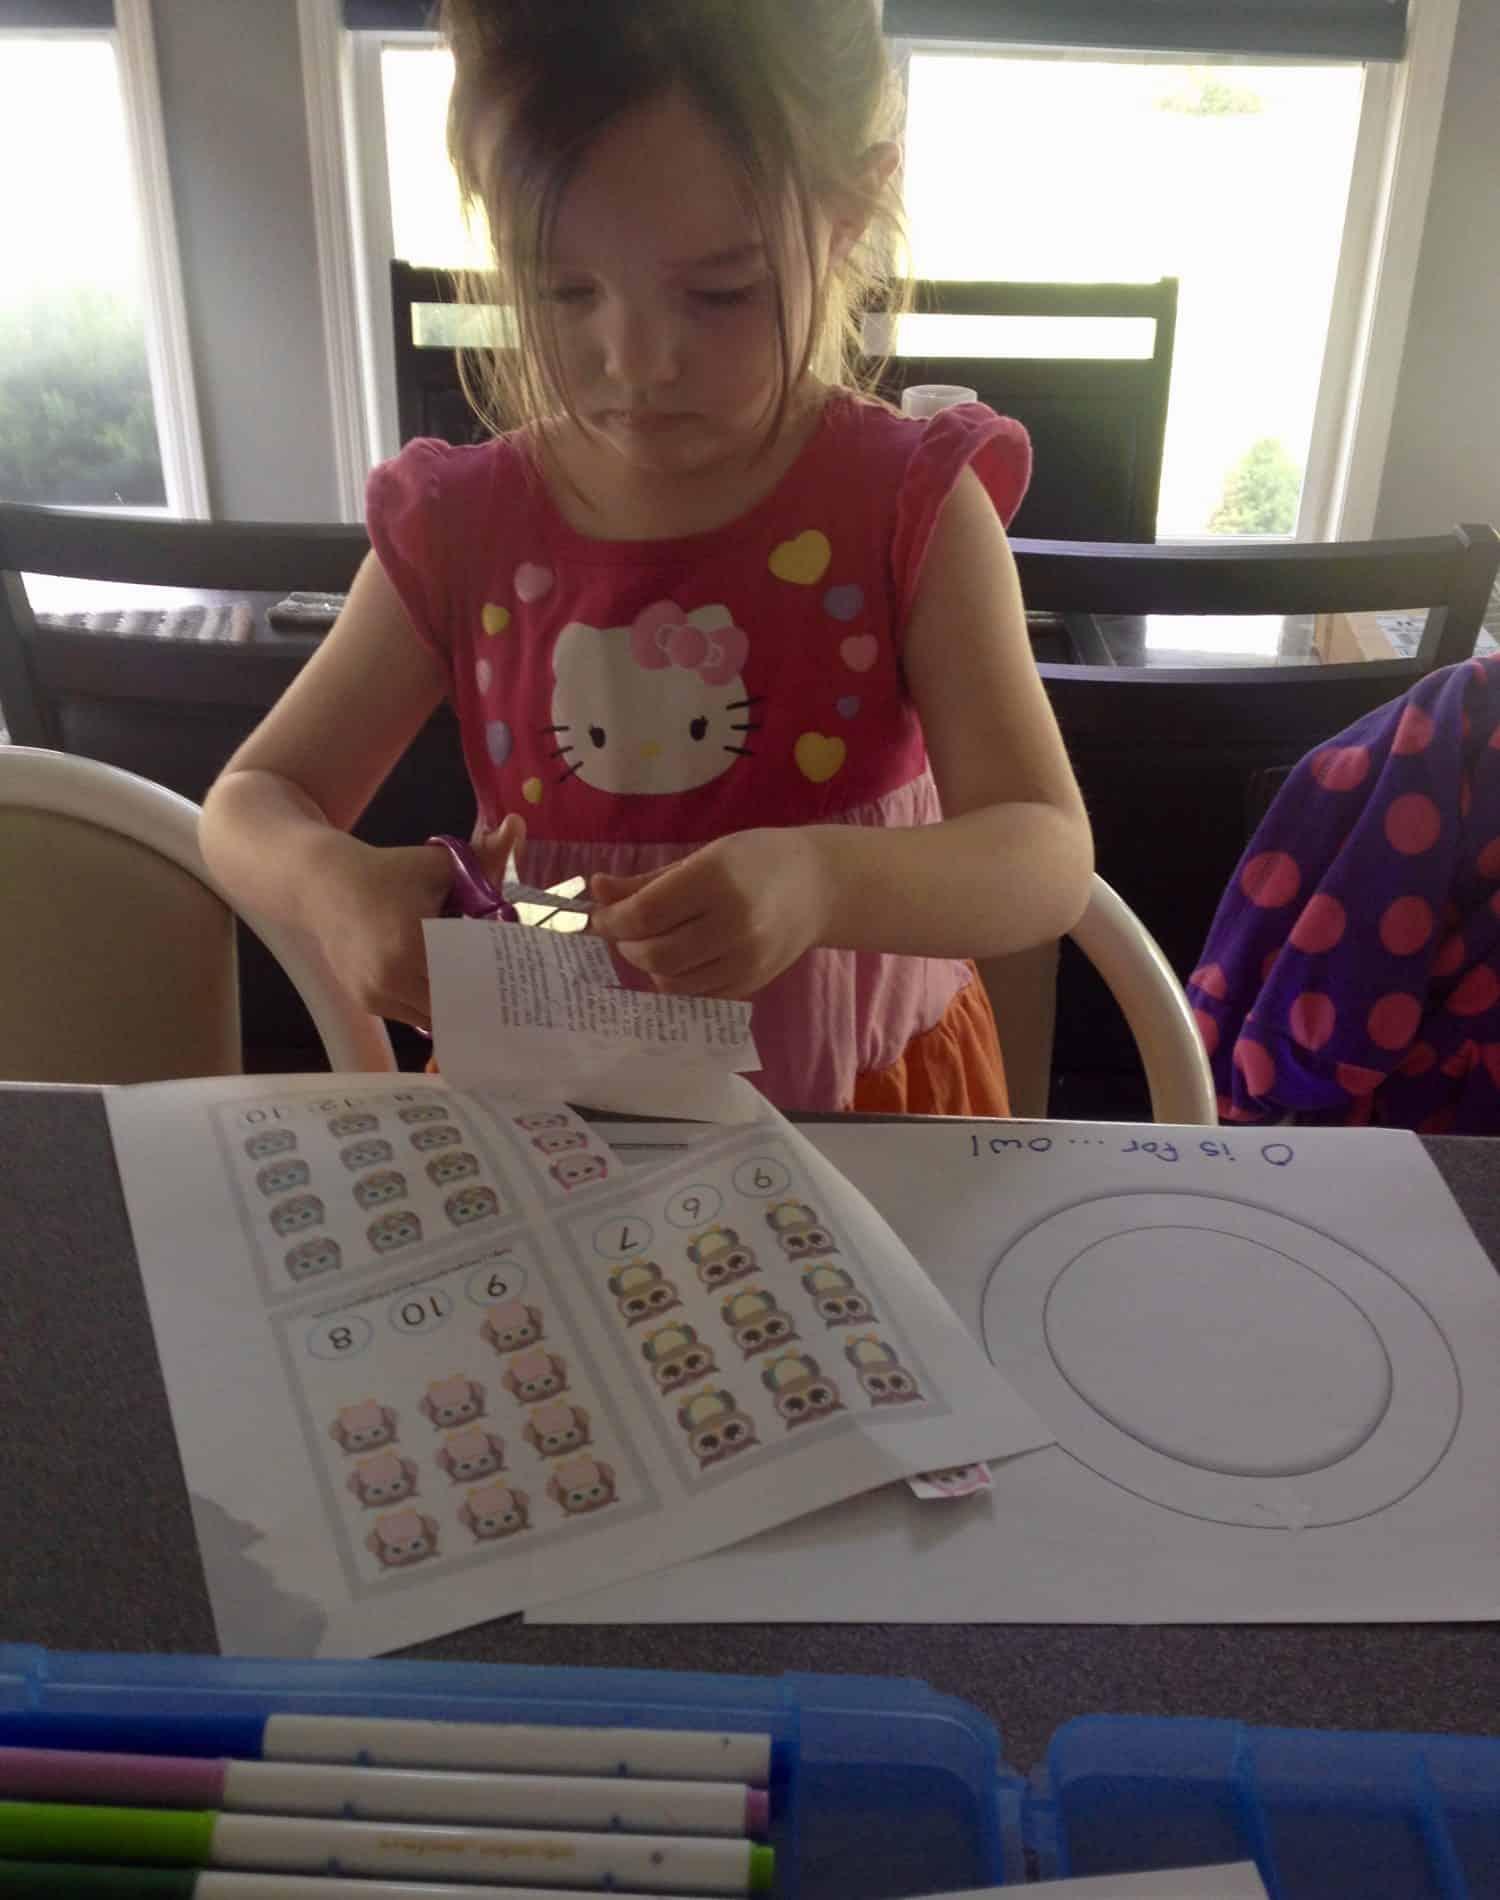 Preschooler gluing paper owls onto a big letter O